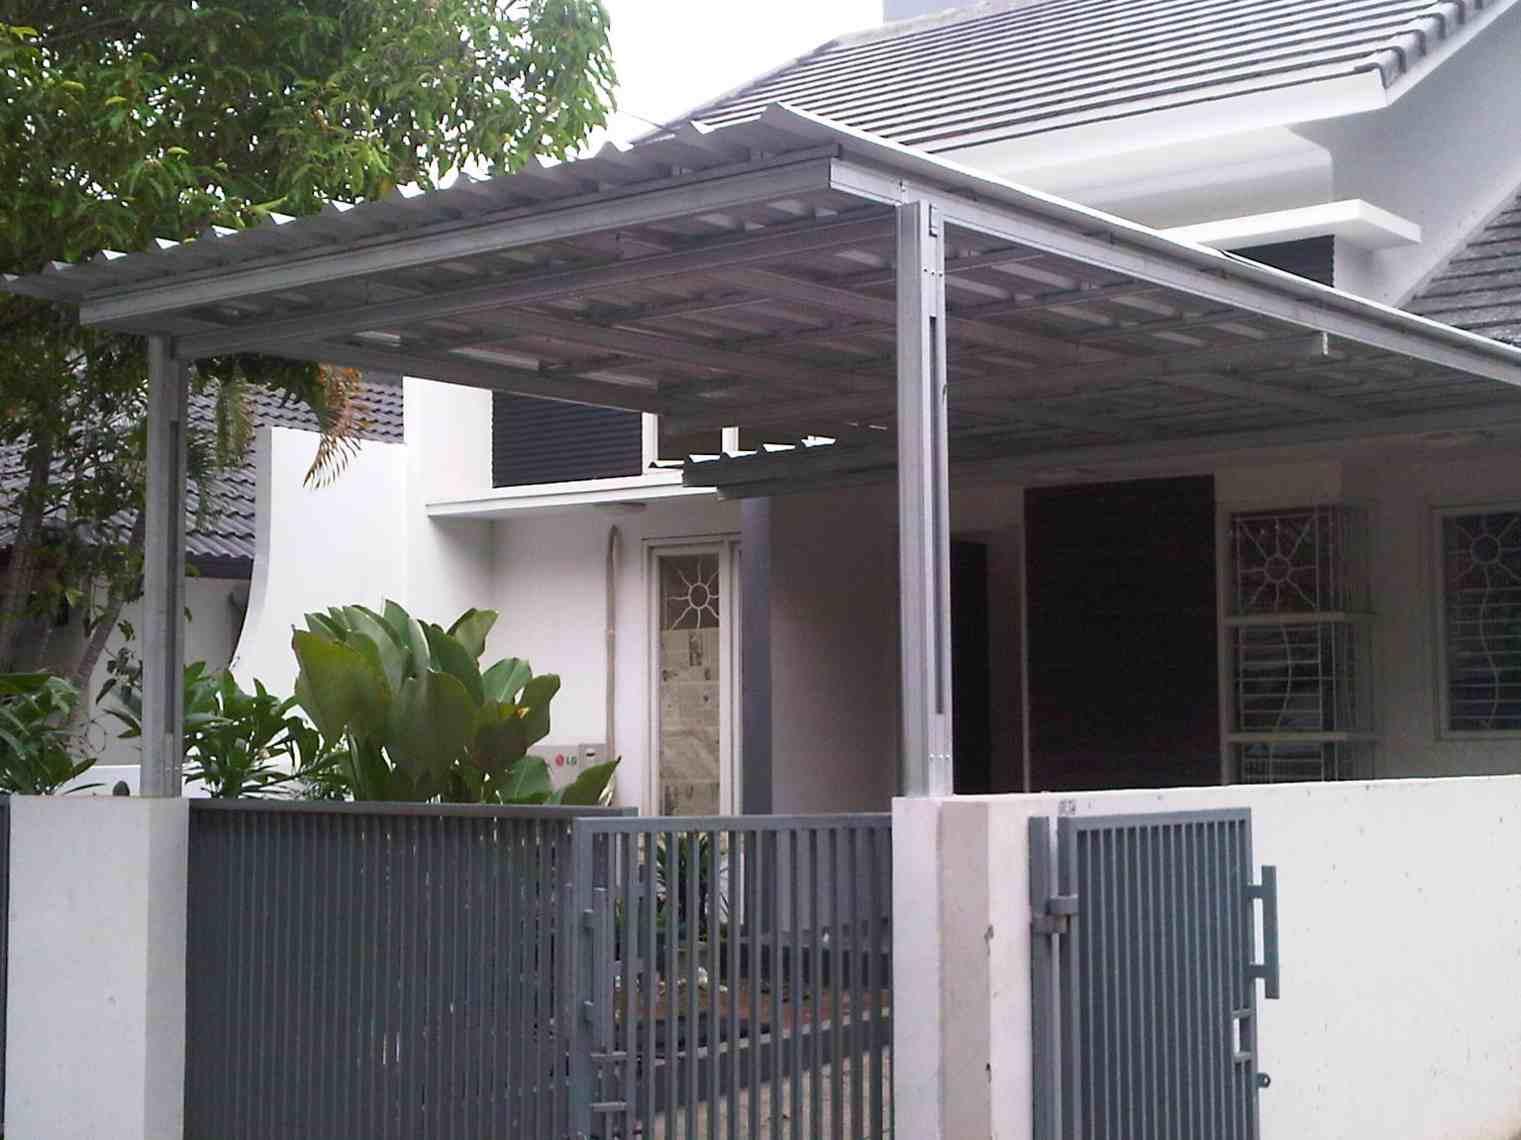 Contoh Kanopi Baja Ringan Minimalis | contoh foto dan desain kanopi rumah minimalis modern | Model Canopy Minimalis Modern